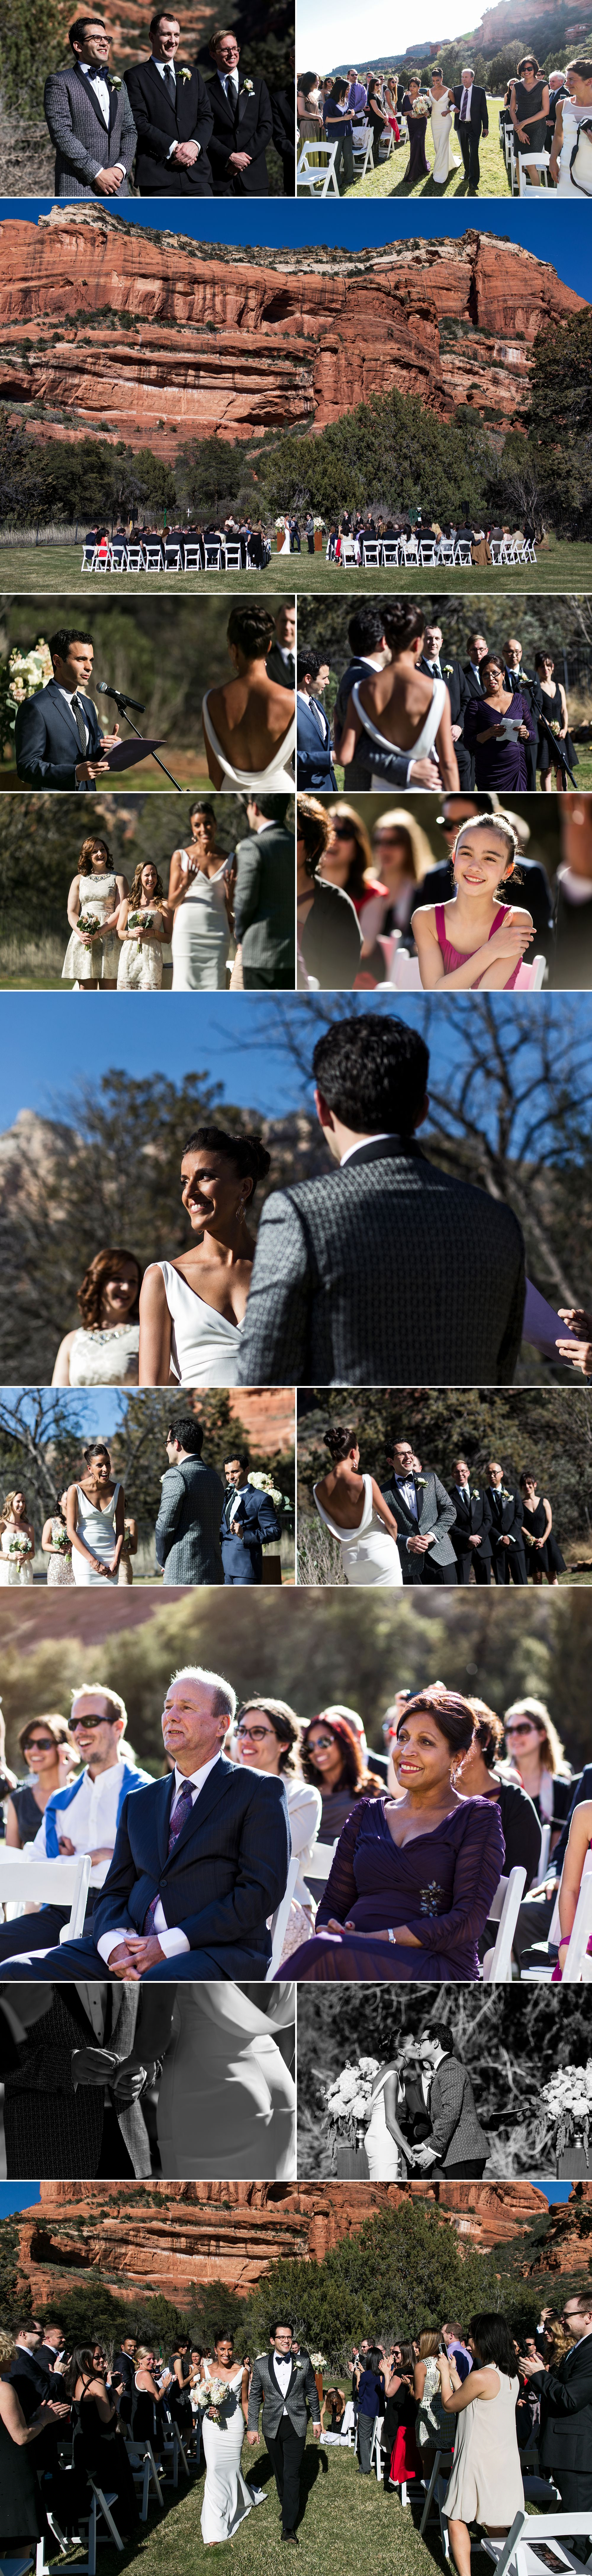 Wedding ceremony at the Enchantment Resort in Sedona Arizona